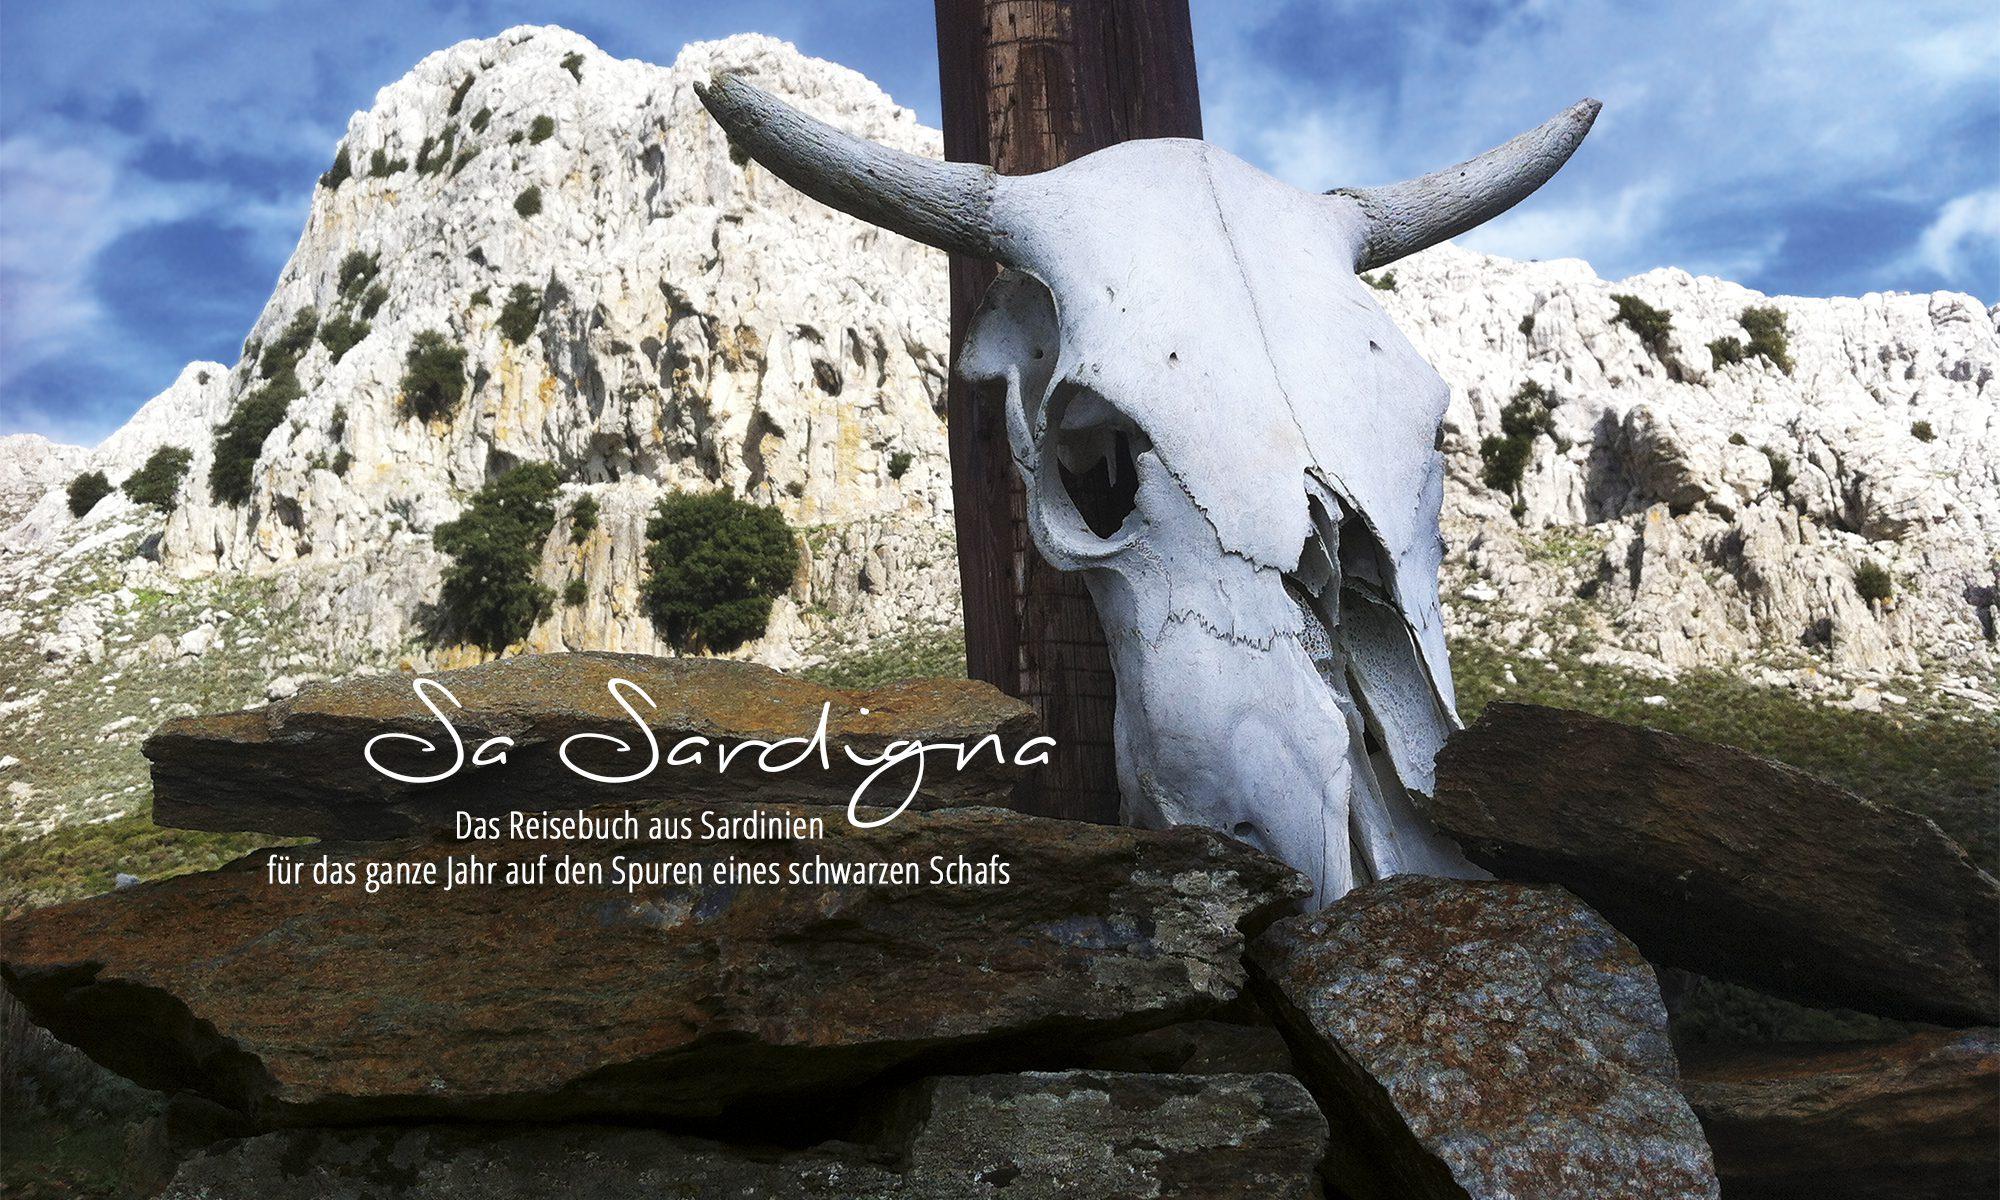 www.sardinien-reisebuch.de